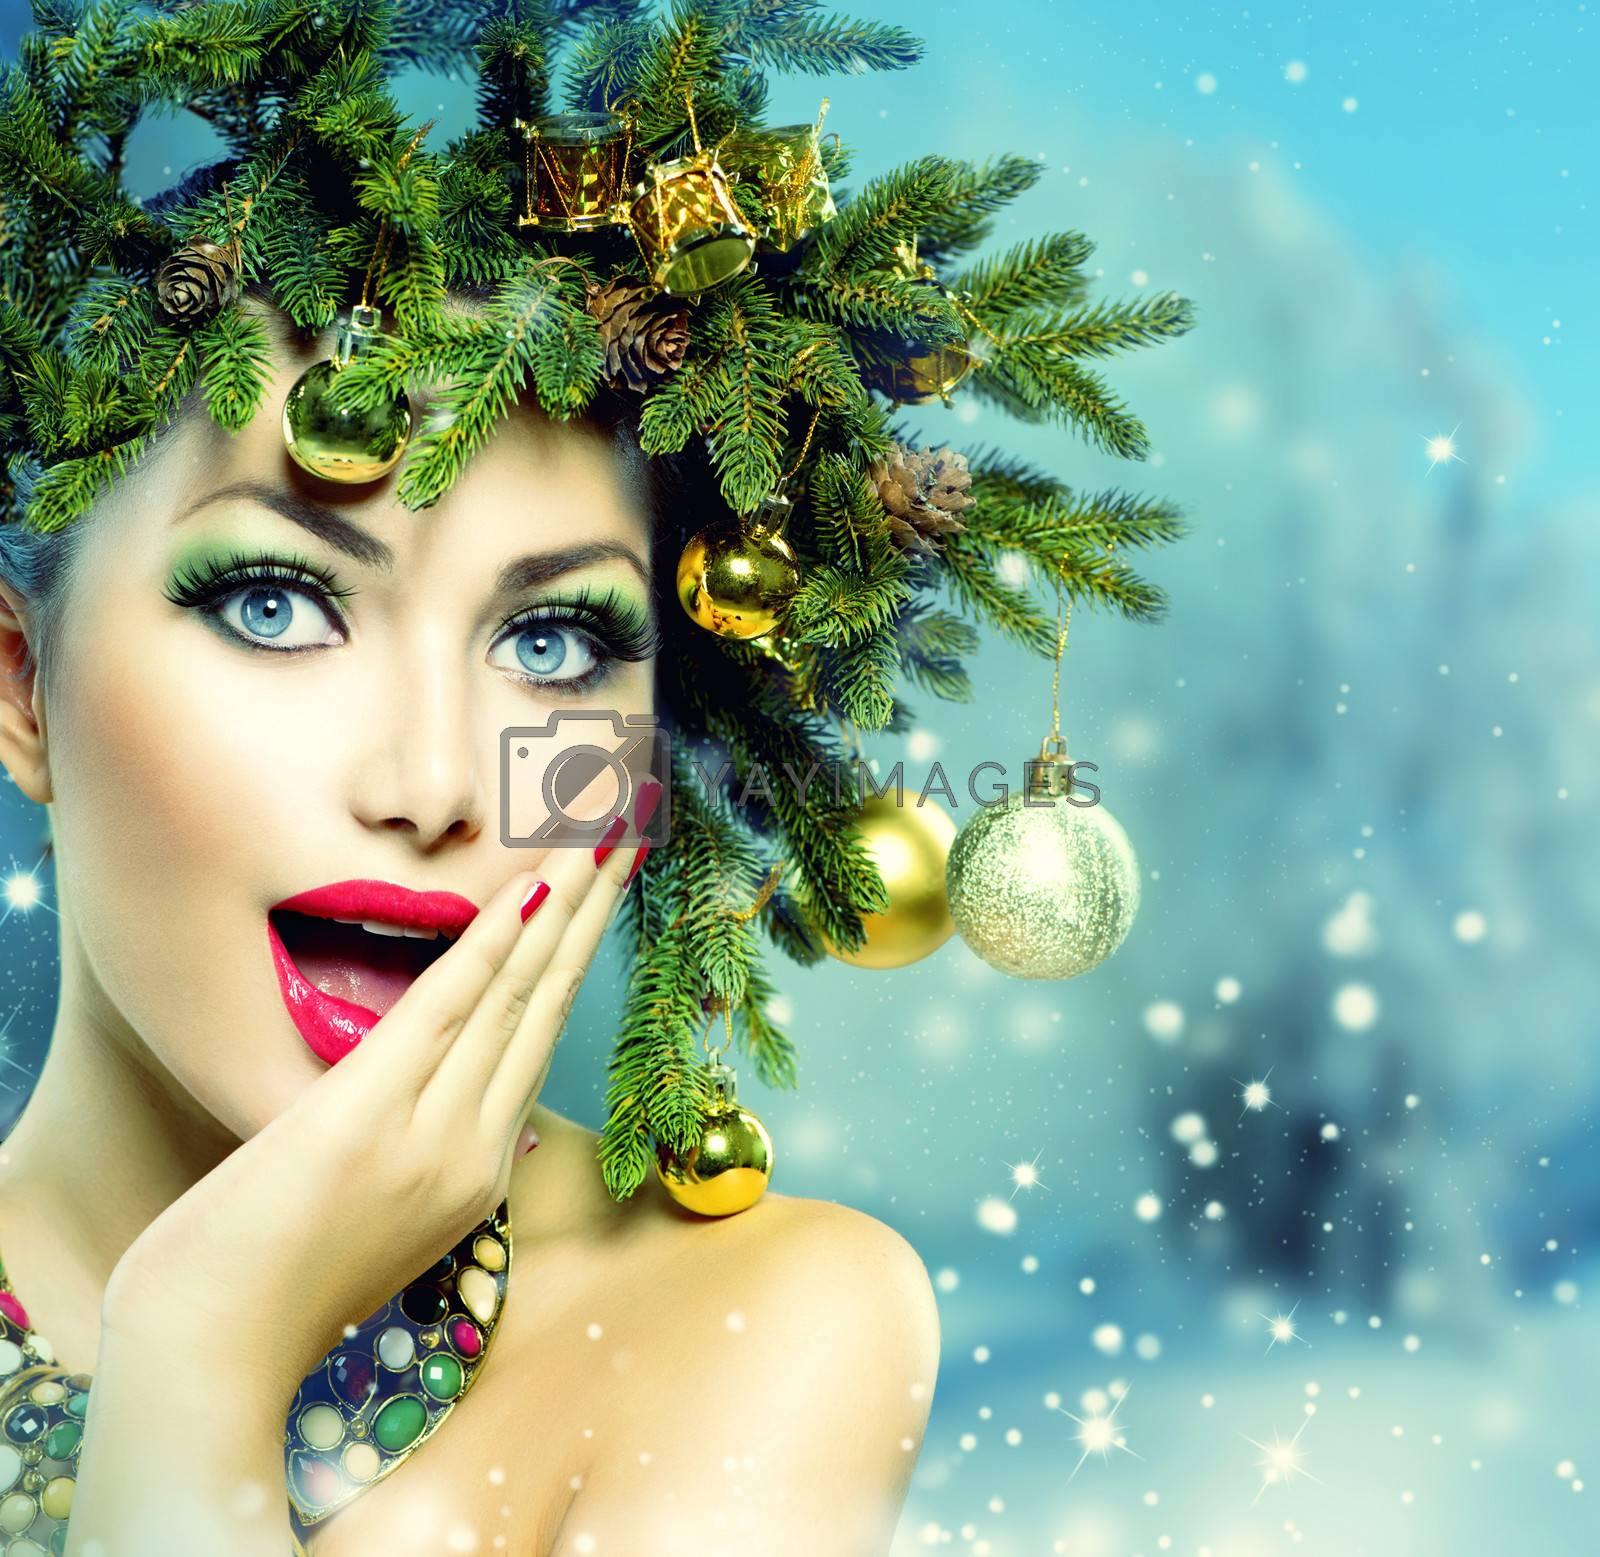 Christmas Woman. Christmas Holiday Hairstyle and Makeup by Subbotina Anna